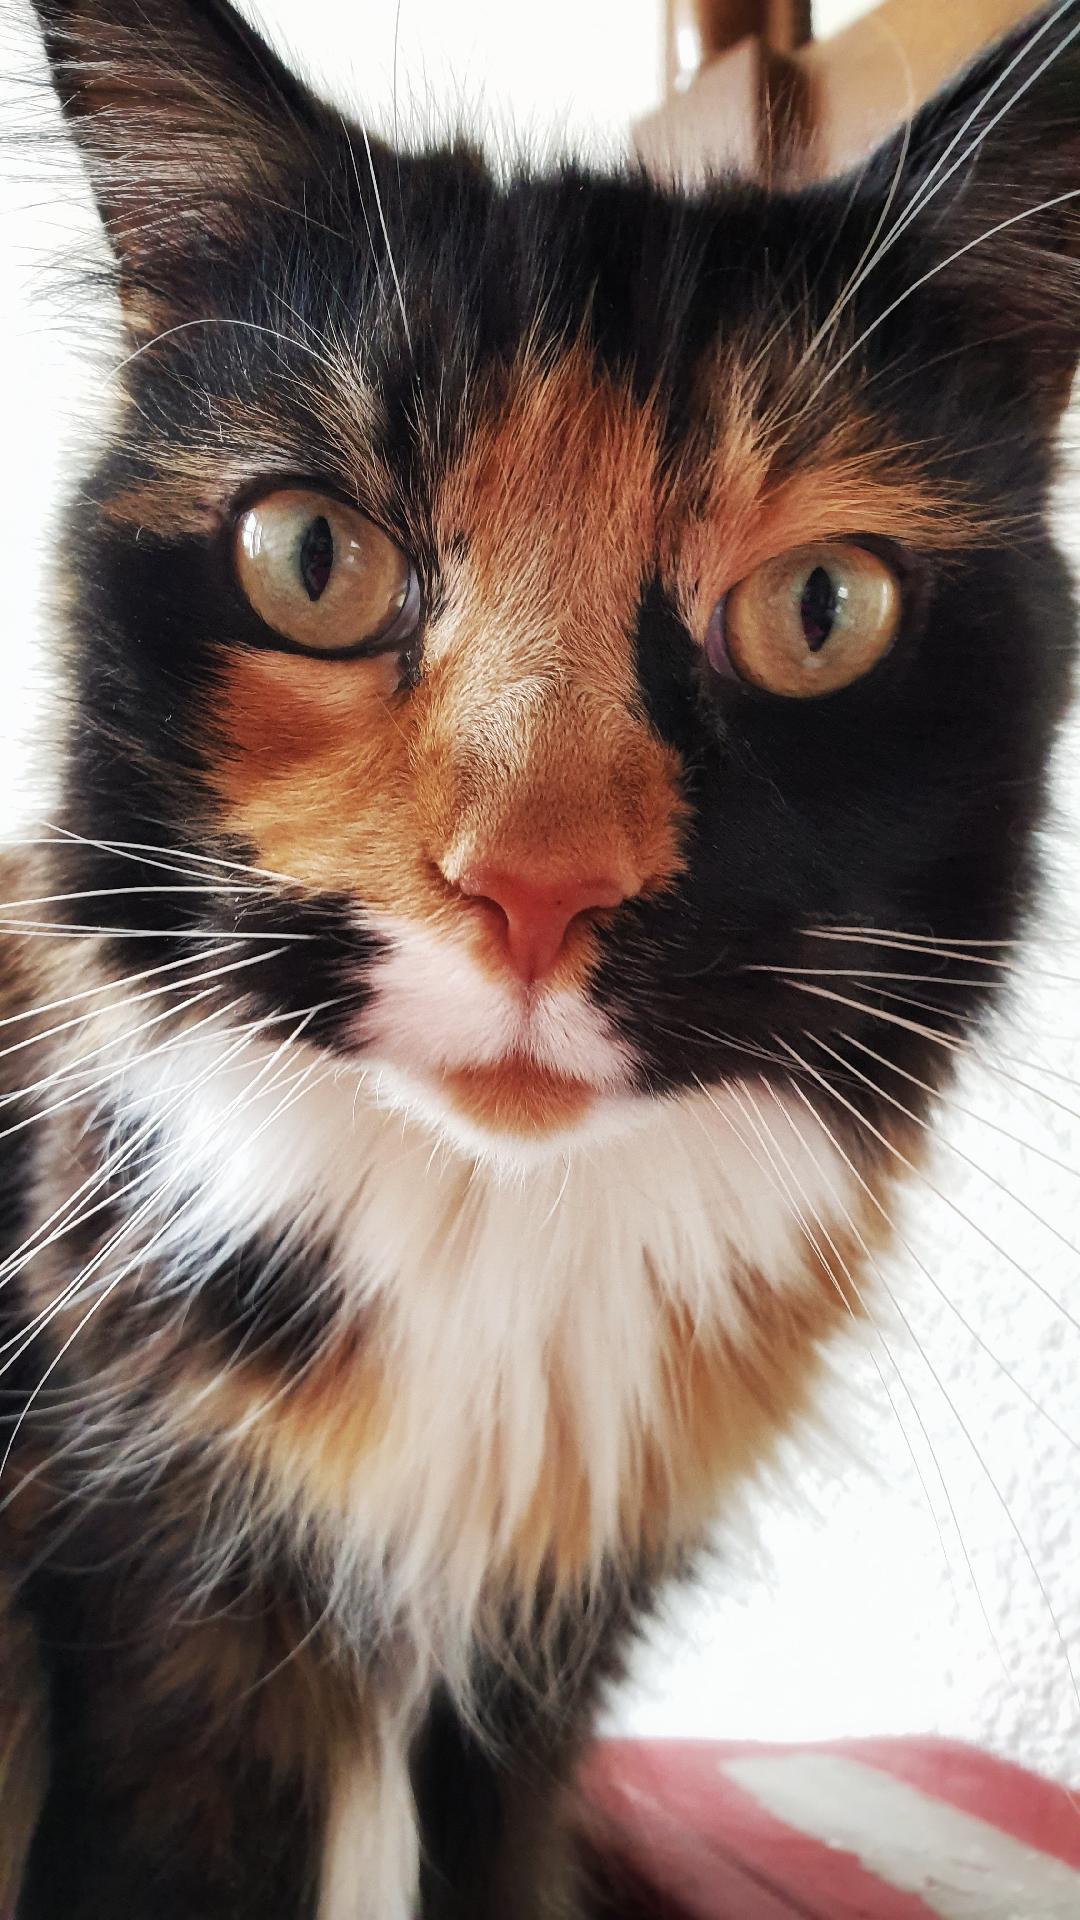 kattenoppasamersfoort